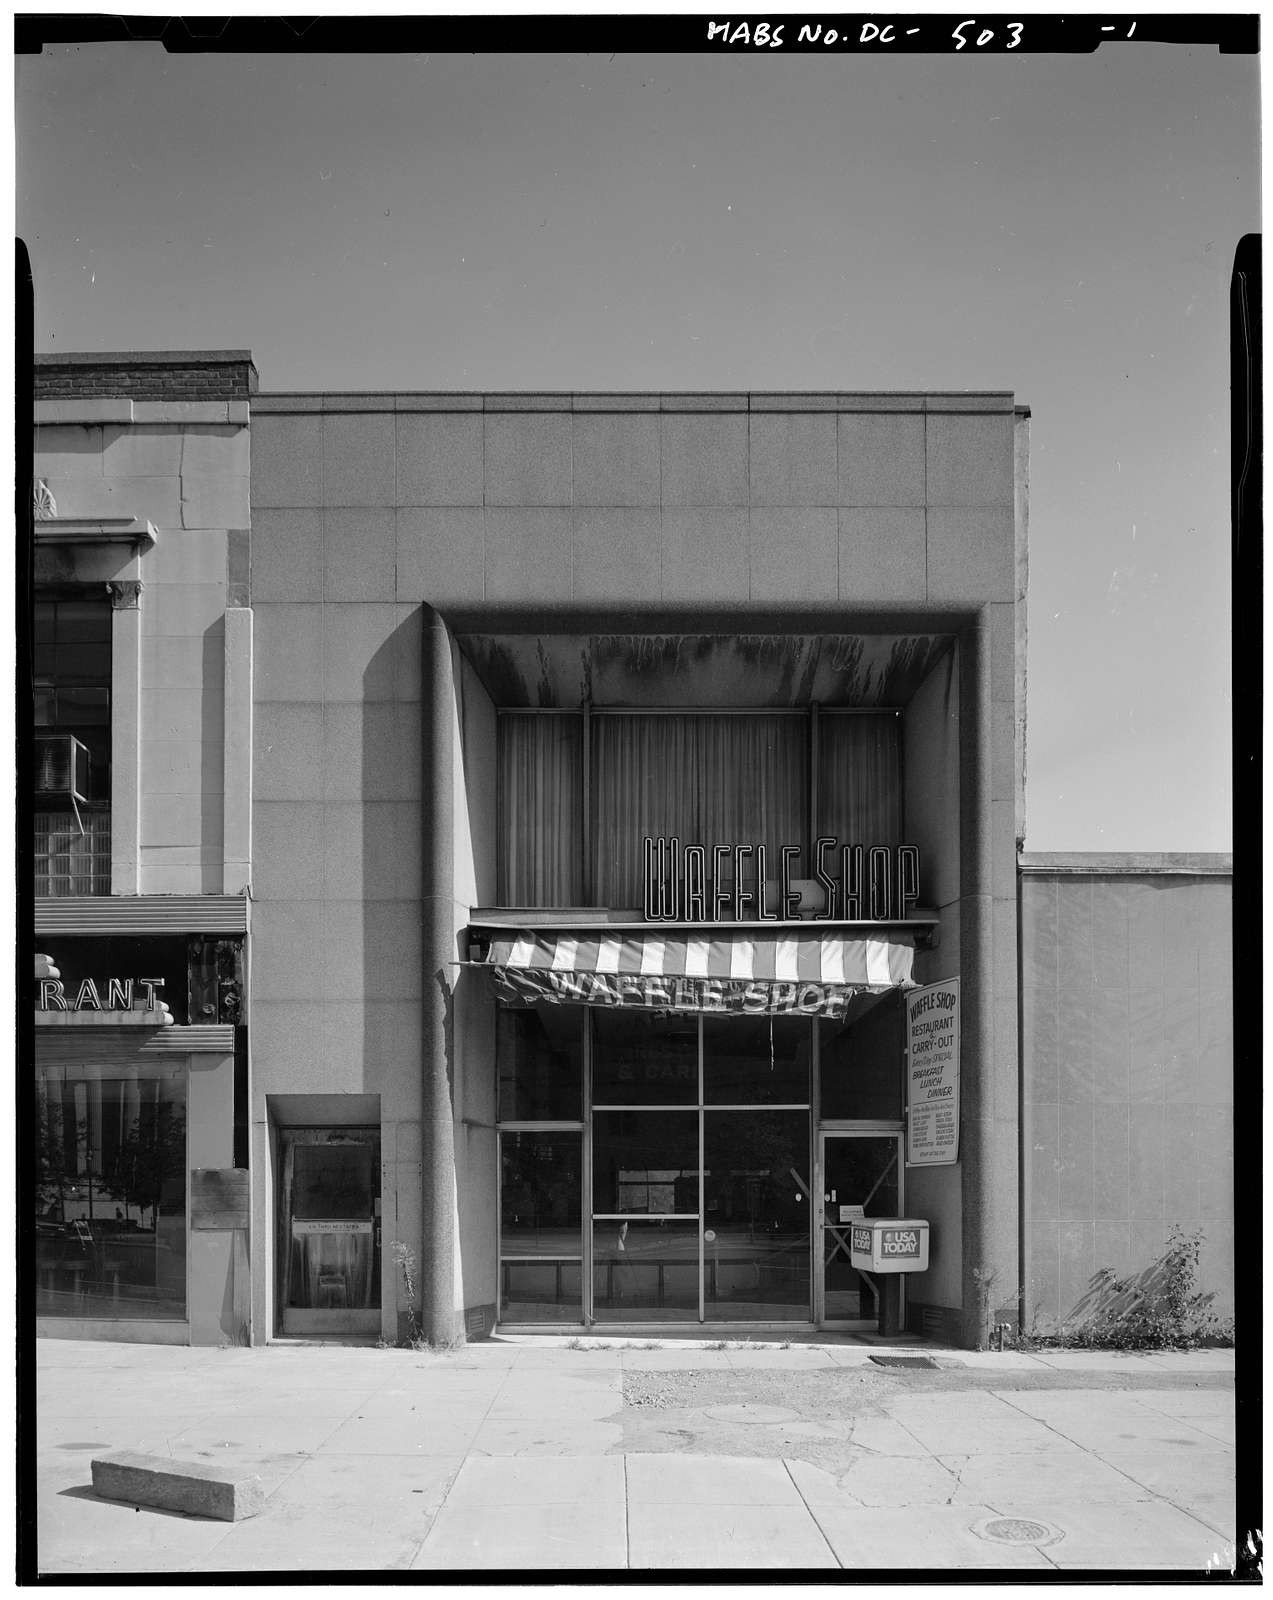 Waffle Shop, 619 Pennsylvania Avenue Northwest, Washington, District of Columbia, DC